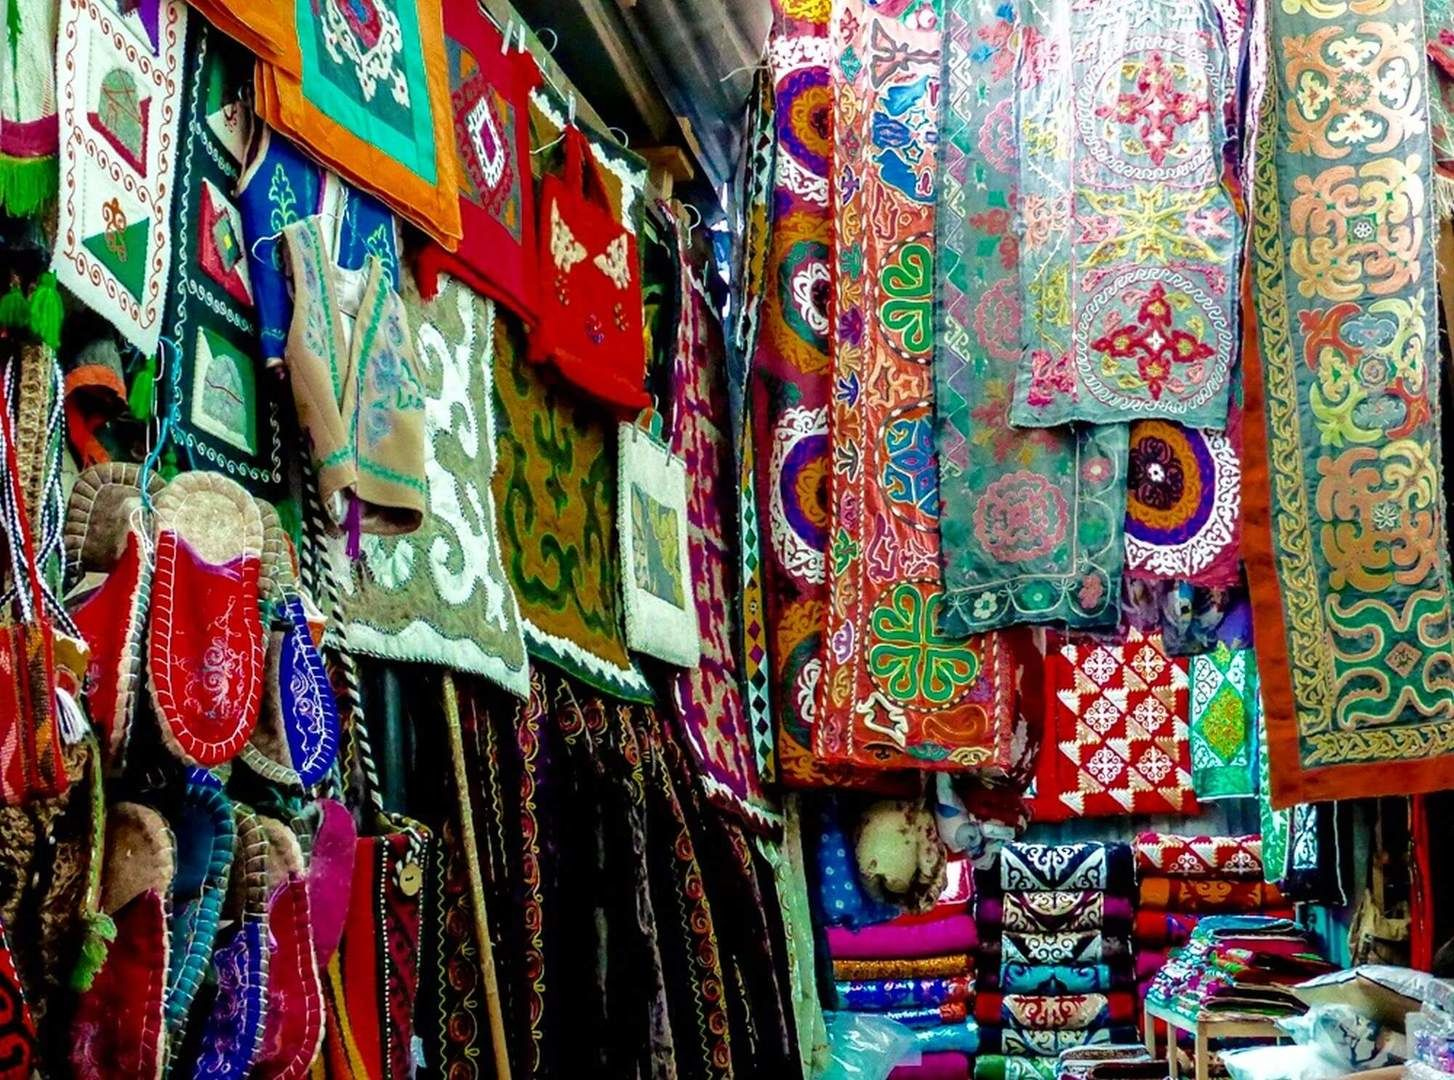 Central Asia, souvenirs, ornaments